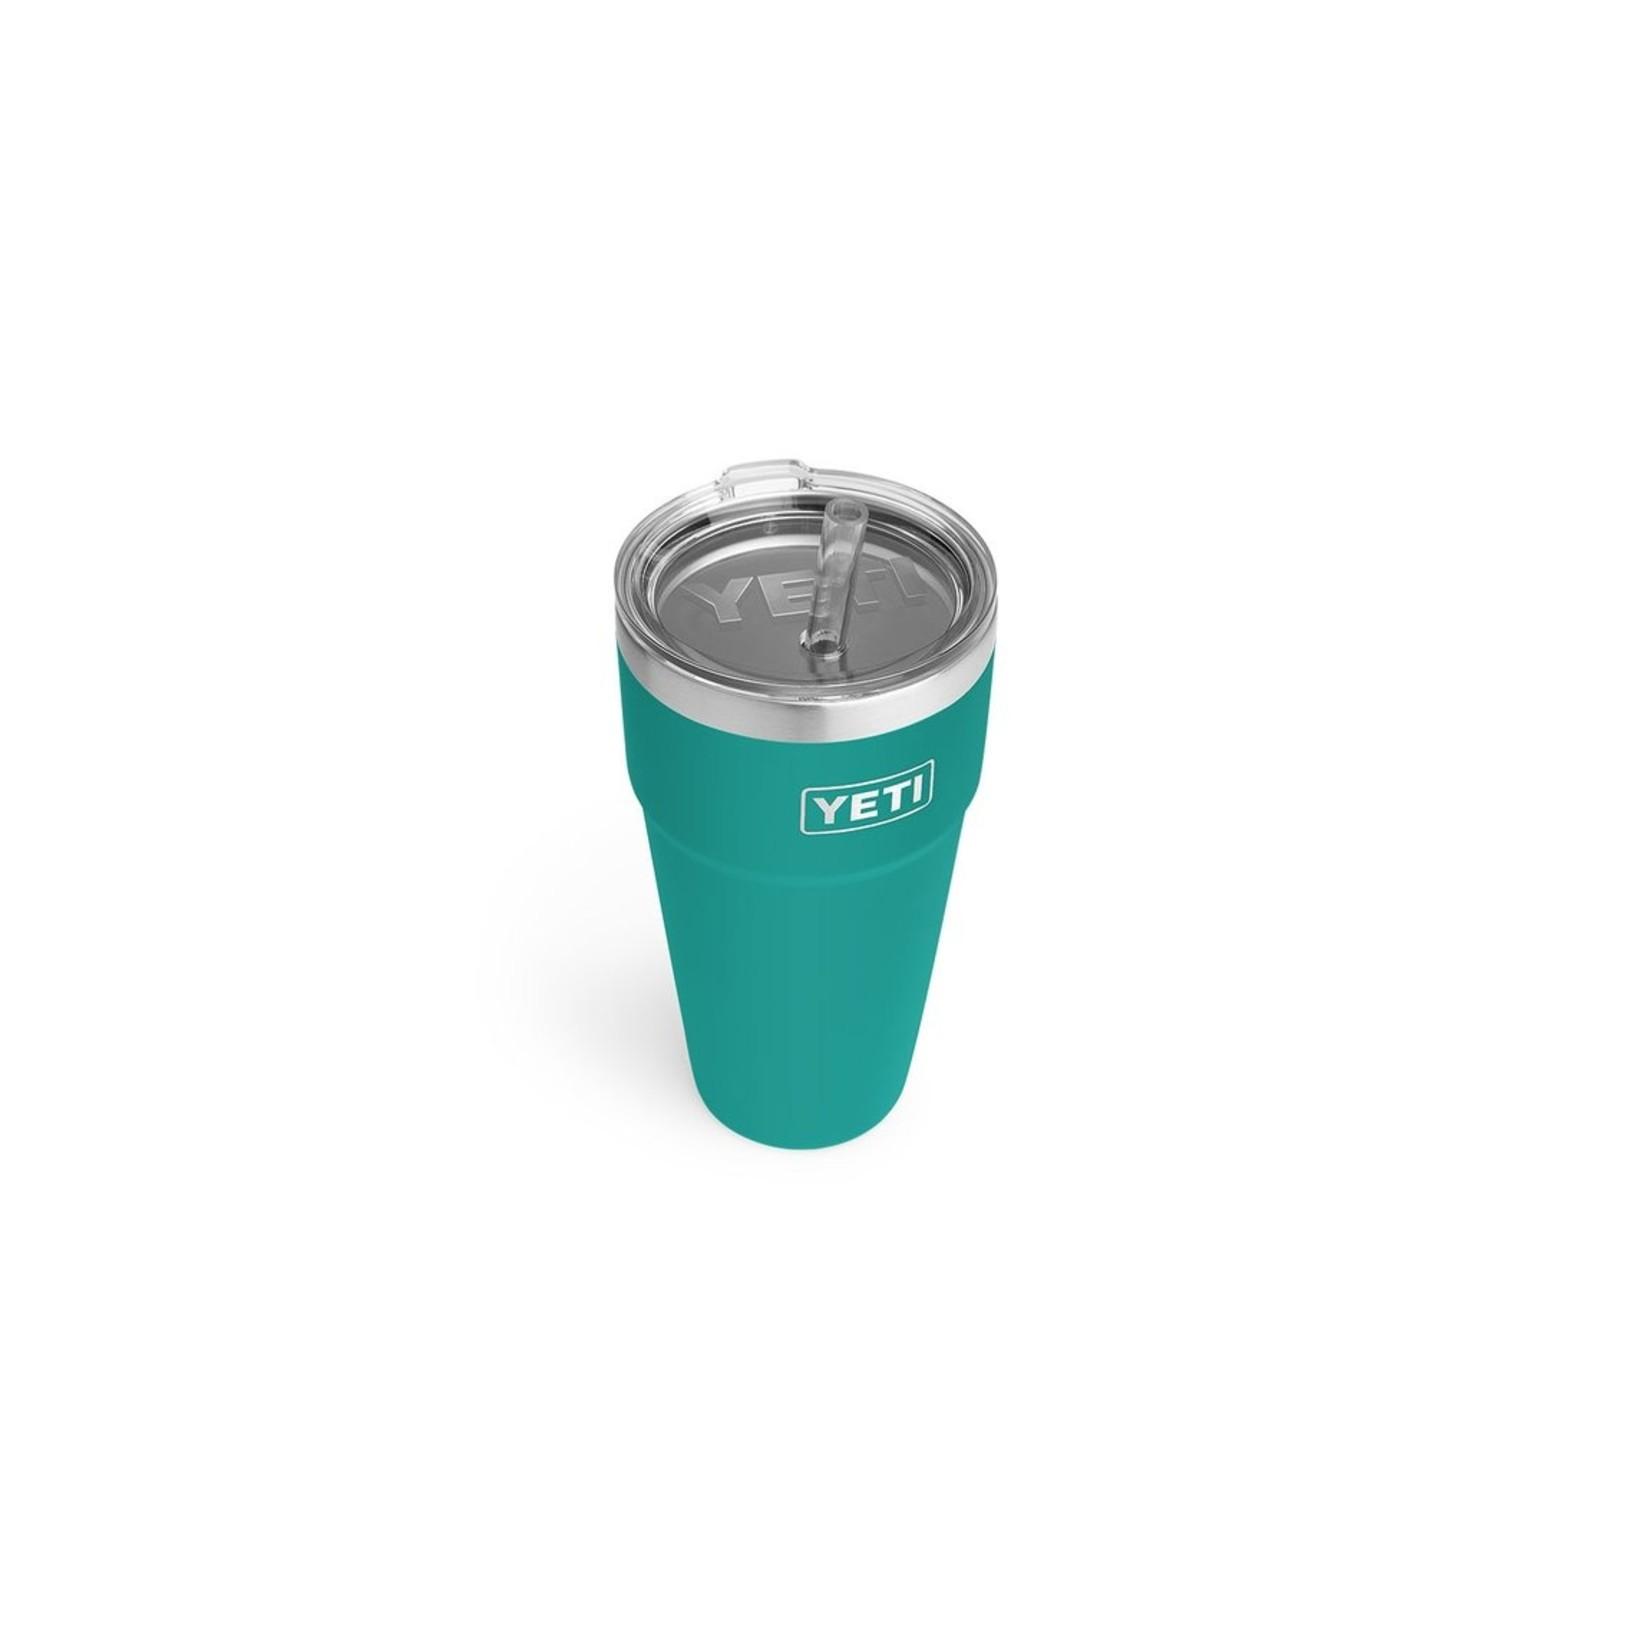 Yeti Yeti Rambler 26 Oz Straw Cup